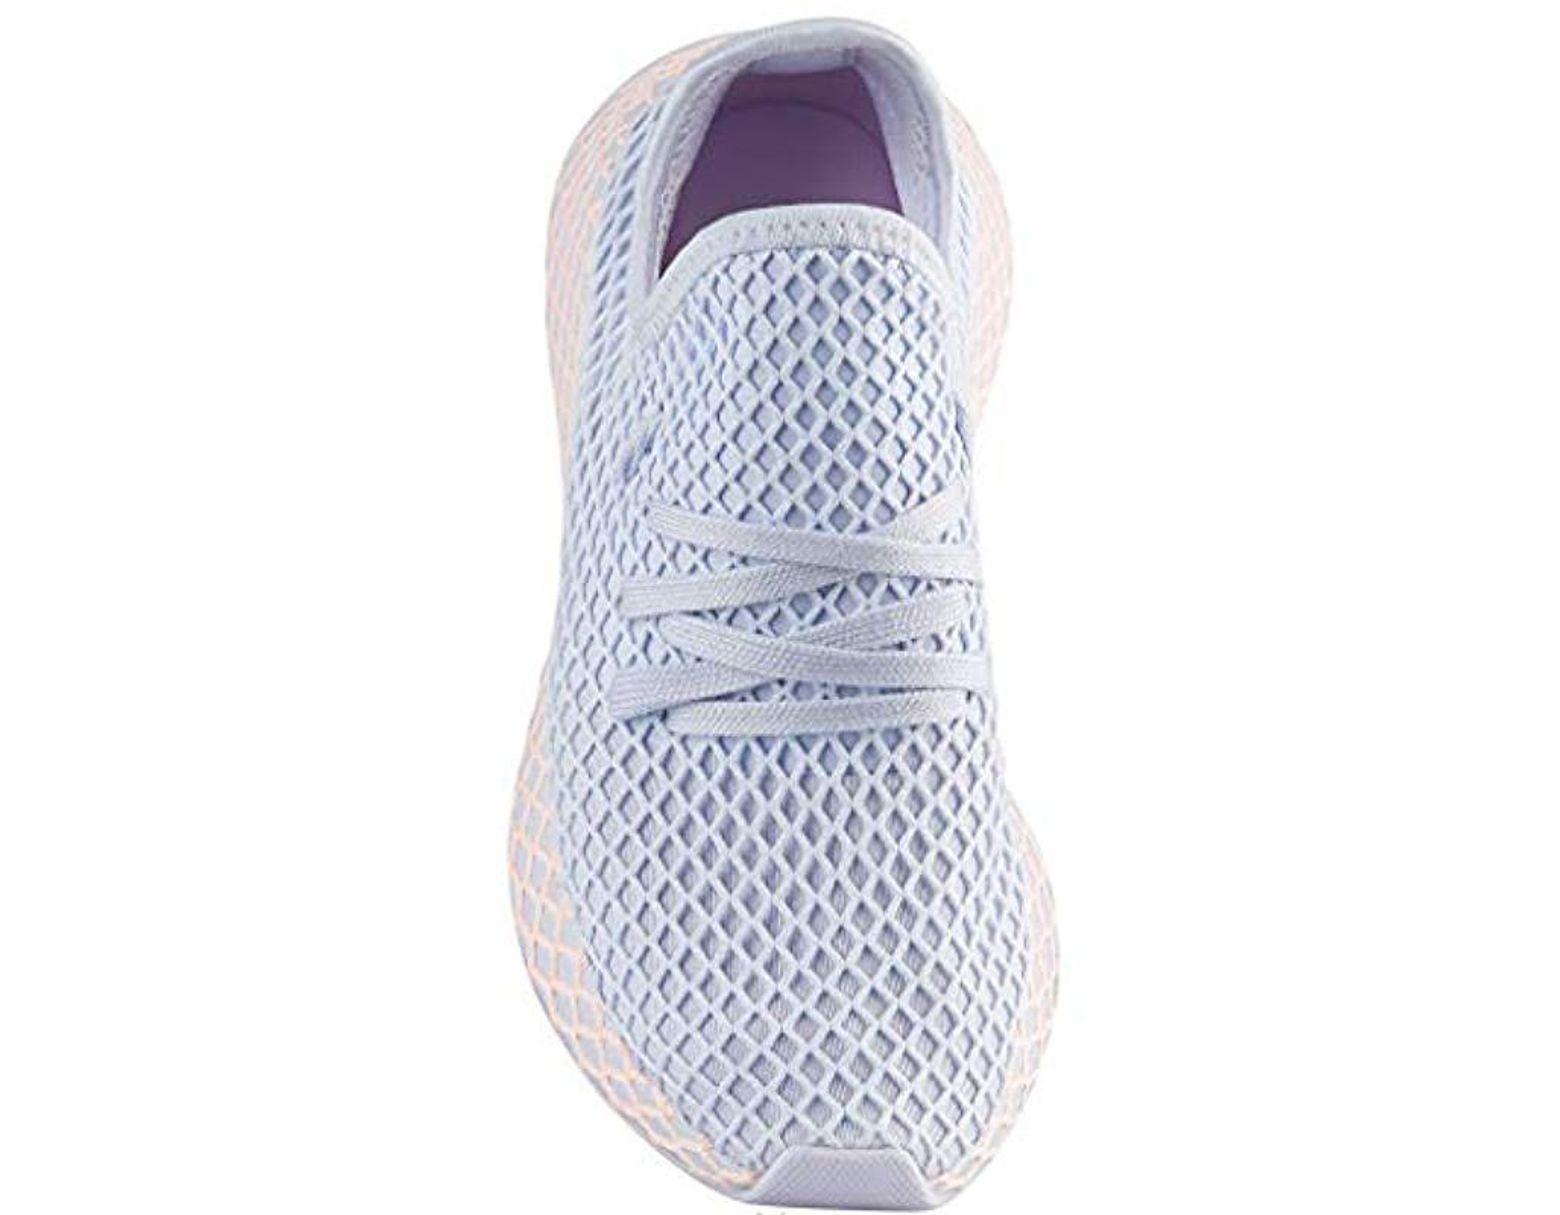 71f41f71eac3b adidas Deerupt Runner W S B37878 in Blue - Lyst